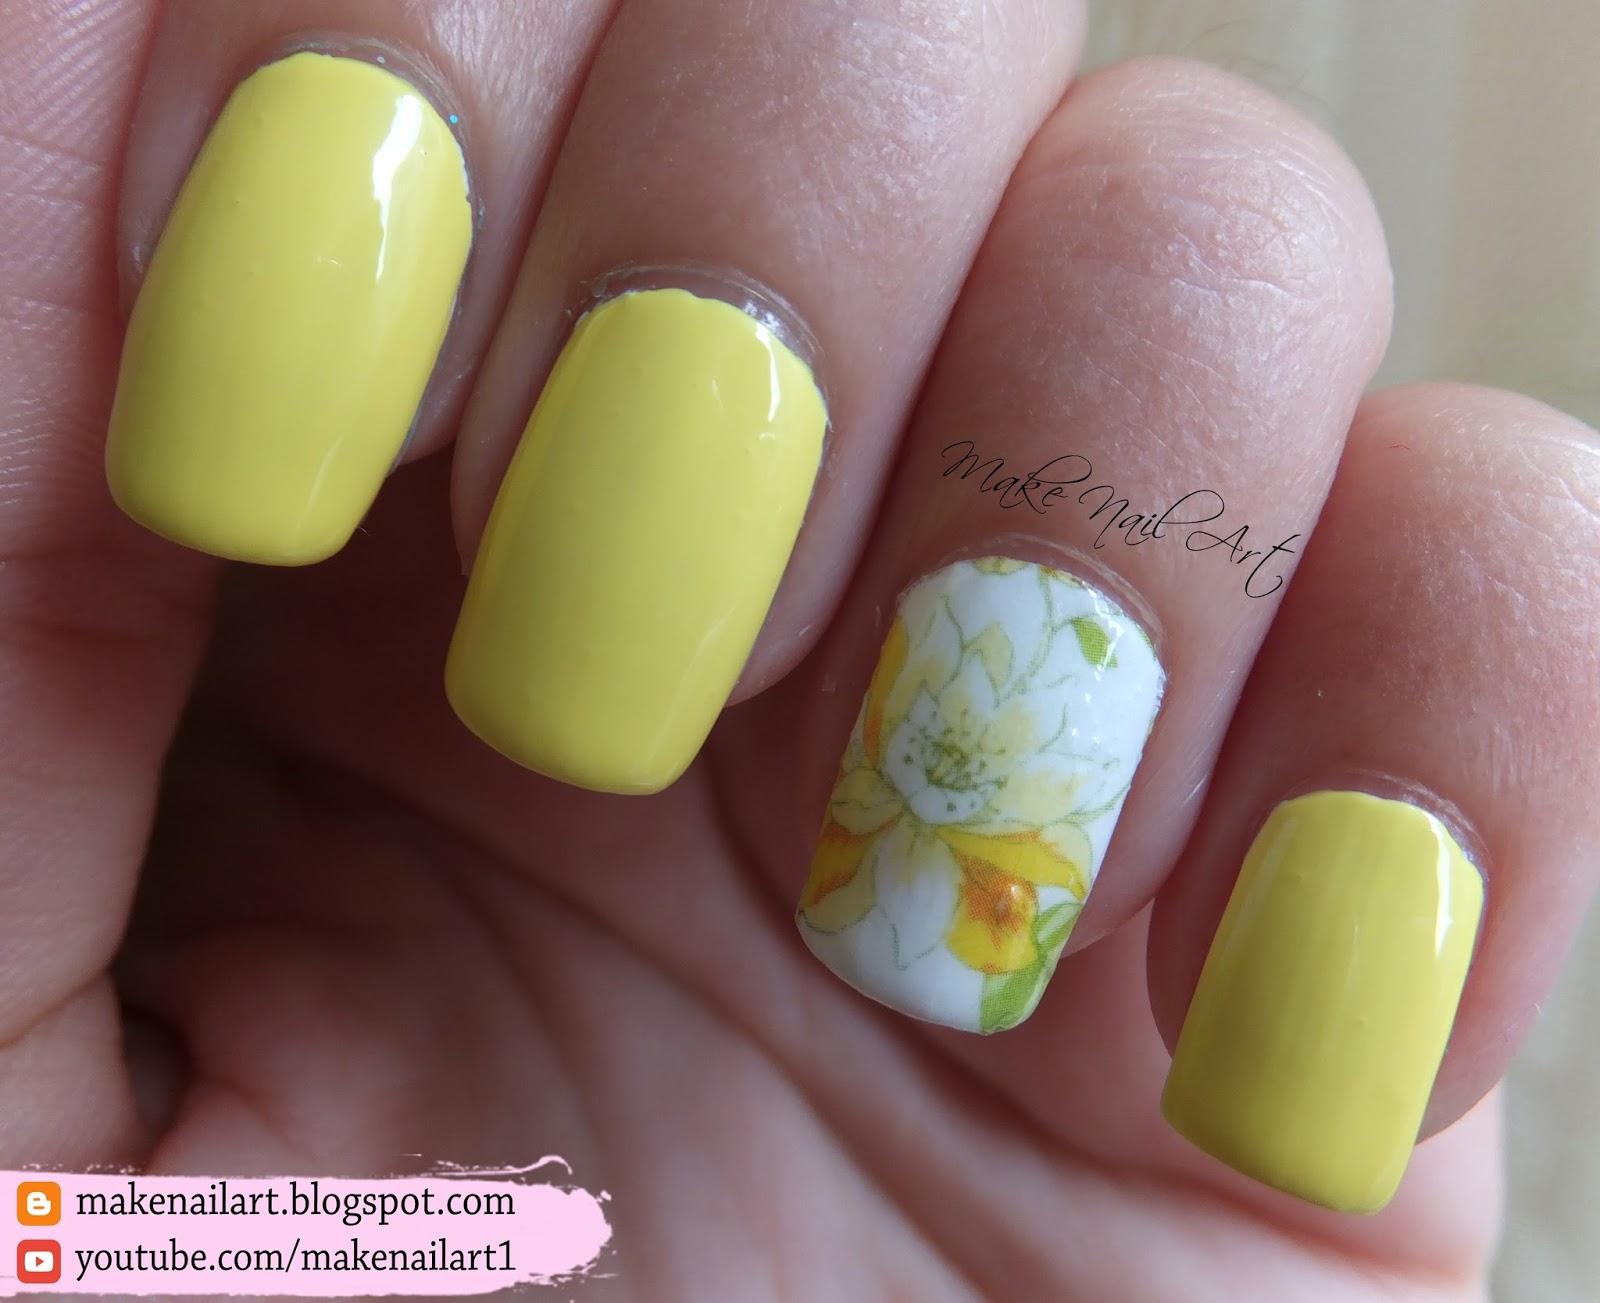 Make Nail Art: Yellow Flower Nail Art Design (31DC2016)